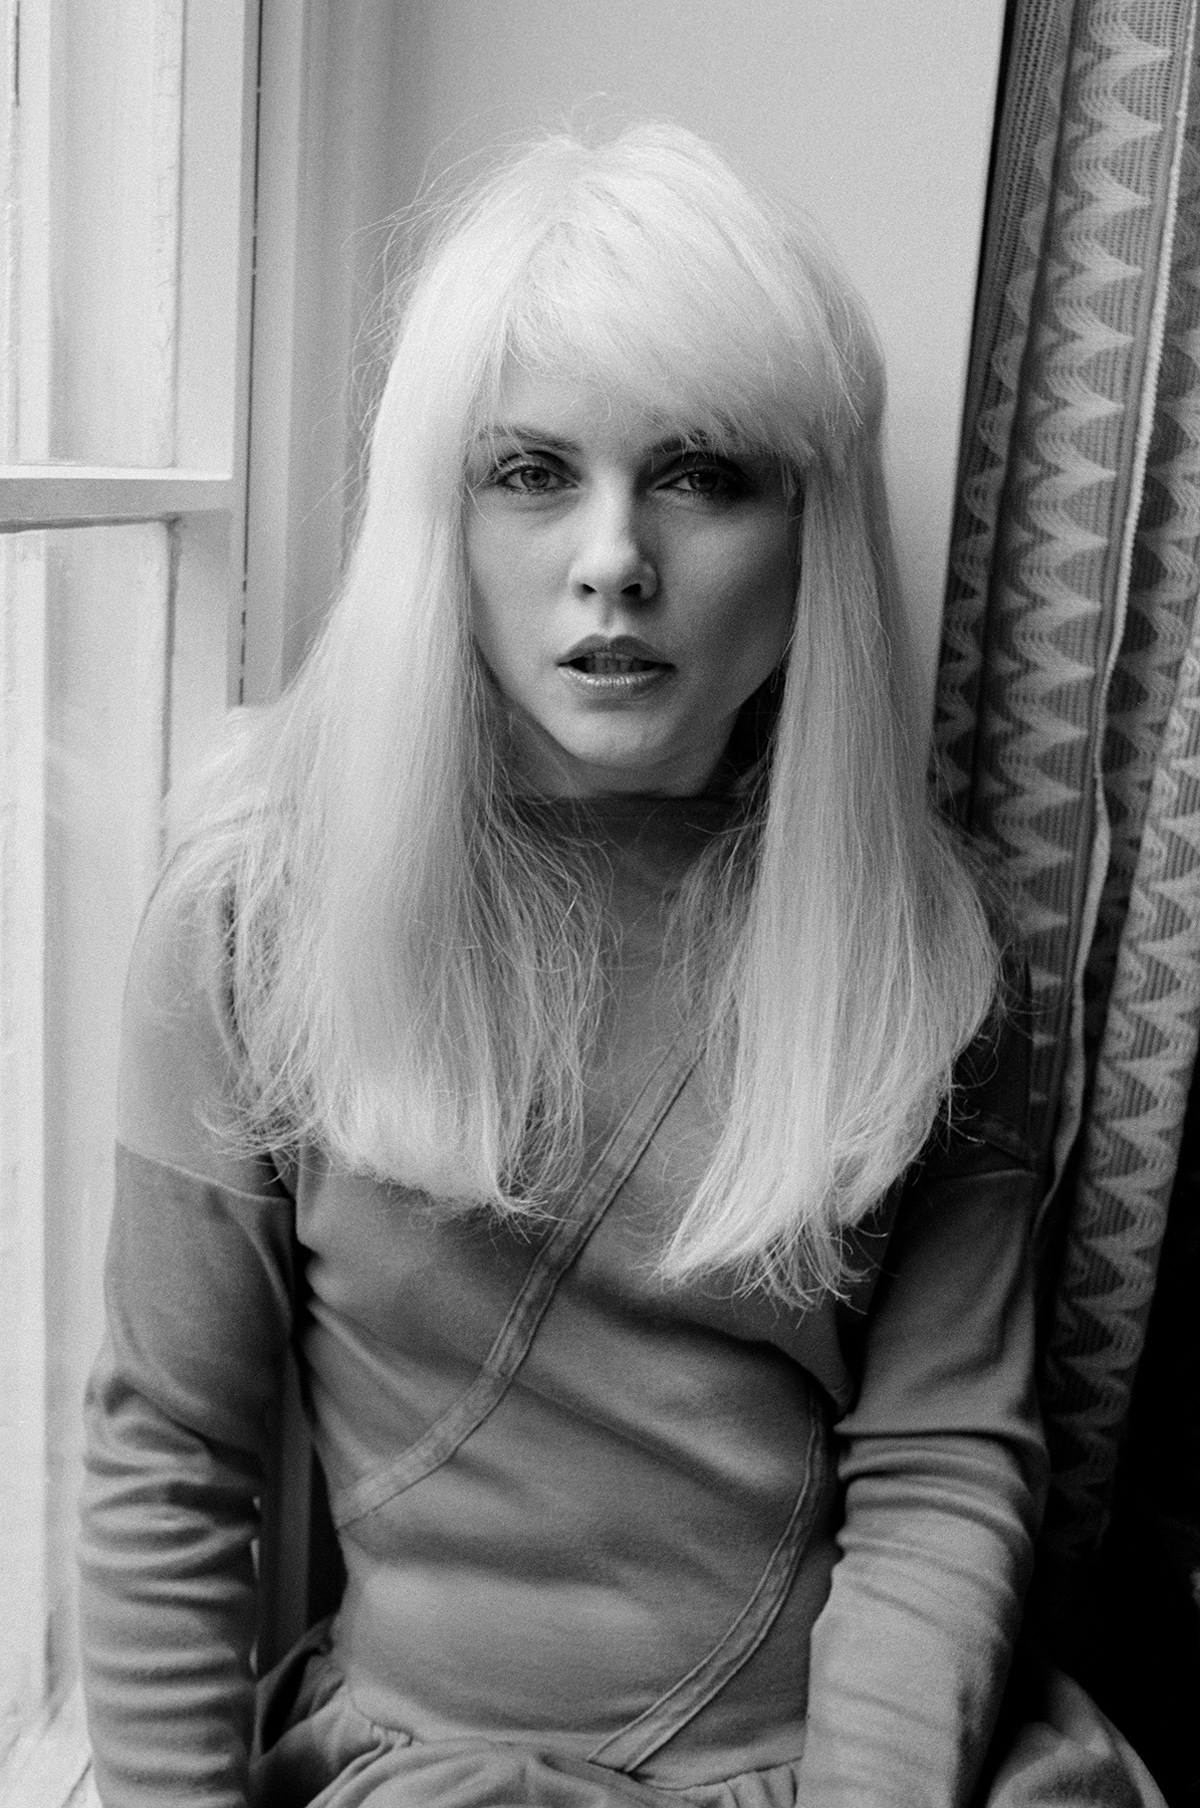 Debbie Harry ©JanetteBeckman London 1979 Courtesy of Fahey:Klein Gallery, Los Angeles